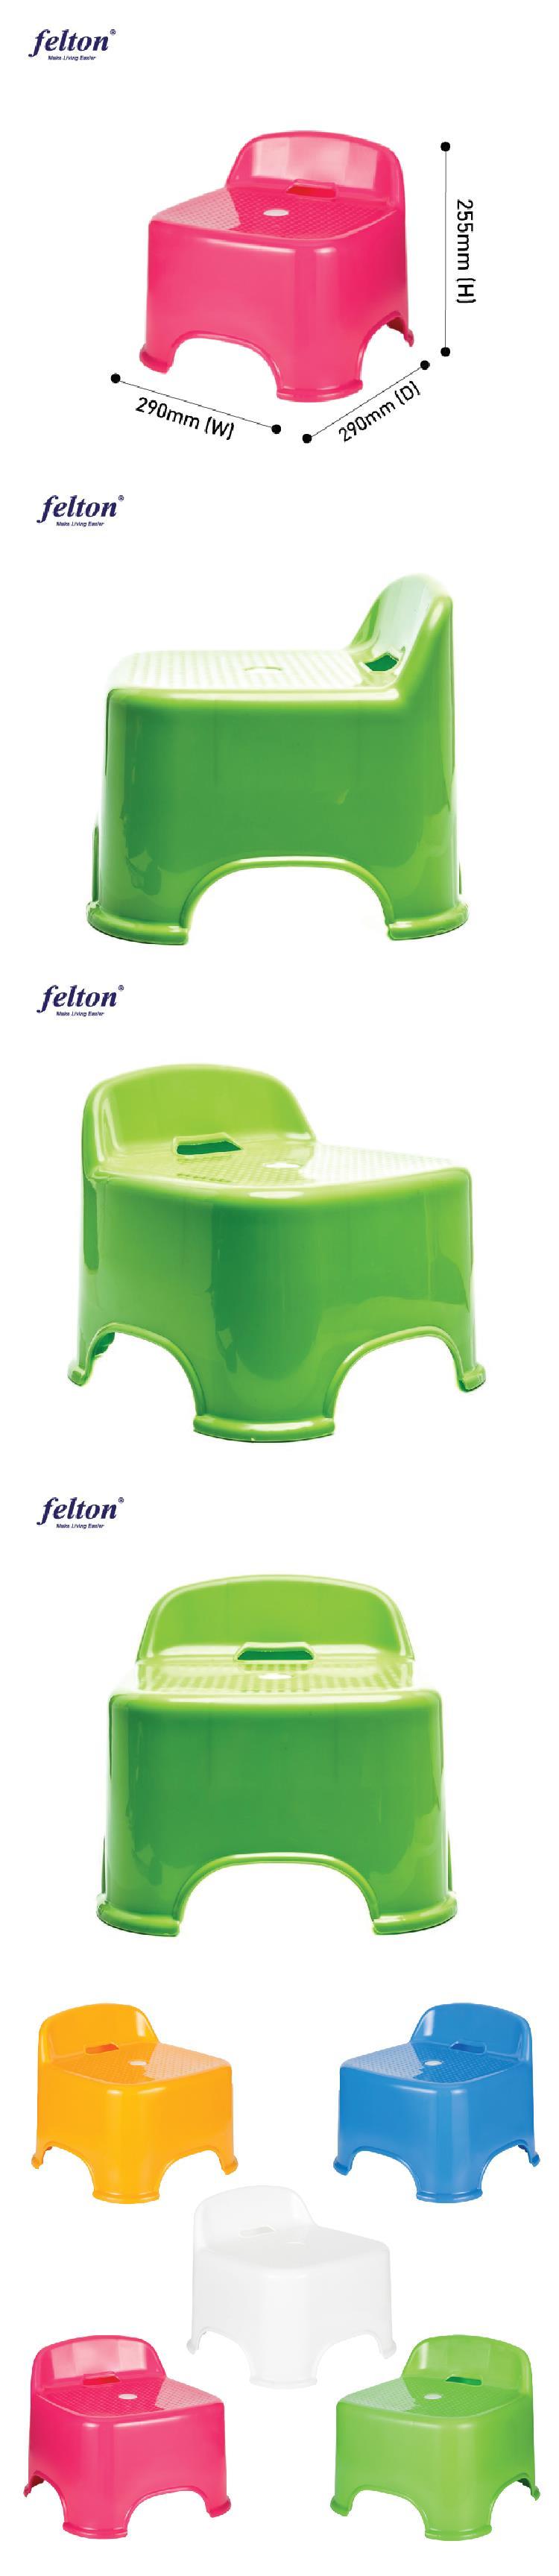 Fabulous Felton Stool Fca2245 Children Kid Chair Sitting Standing Bathroom Onthecornerstone Fun Painted Chair Ideas Images Onthecornerstoneorg